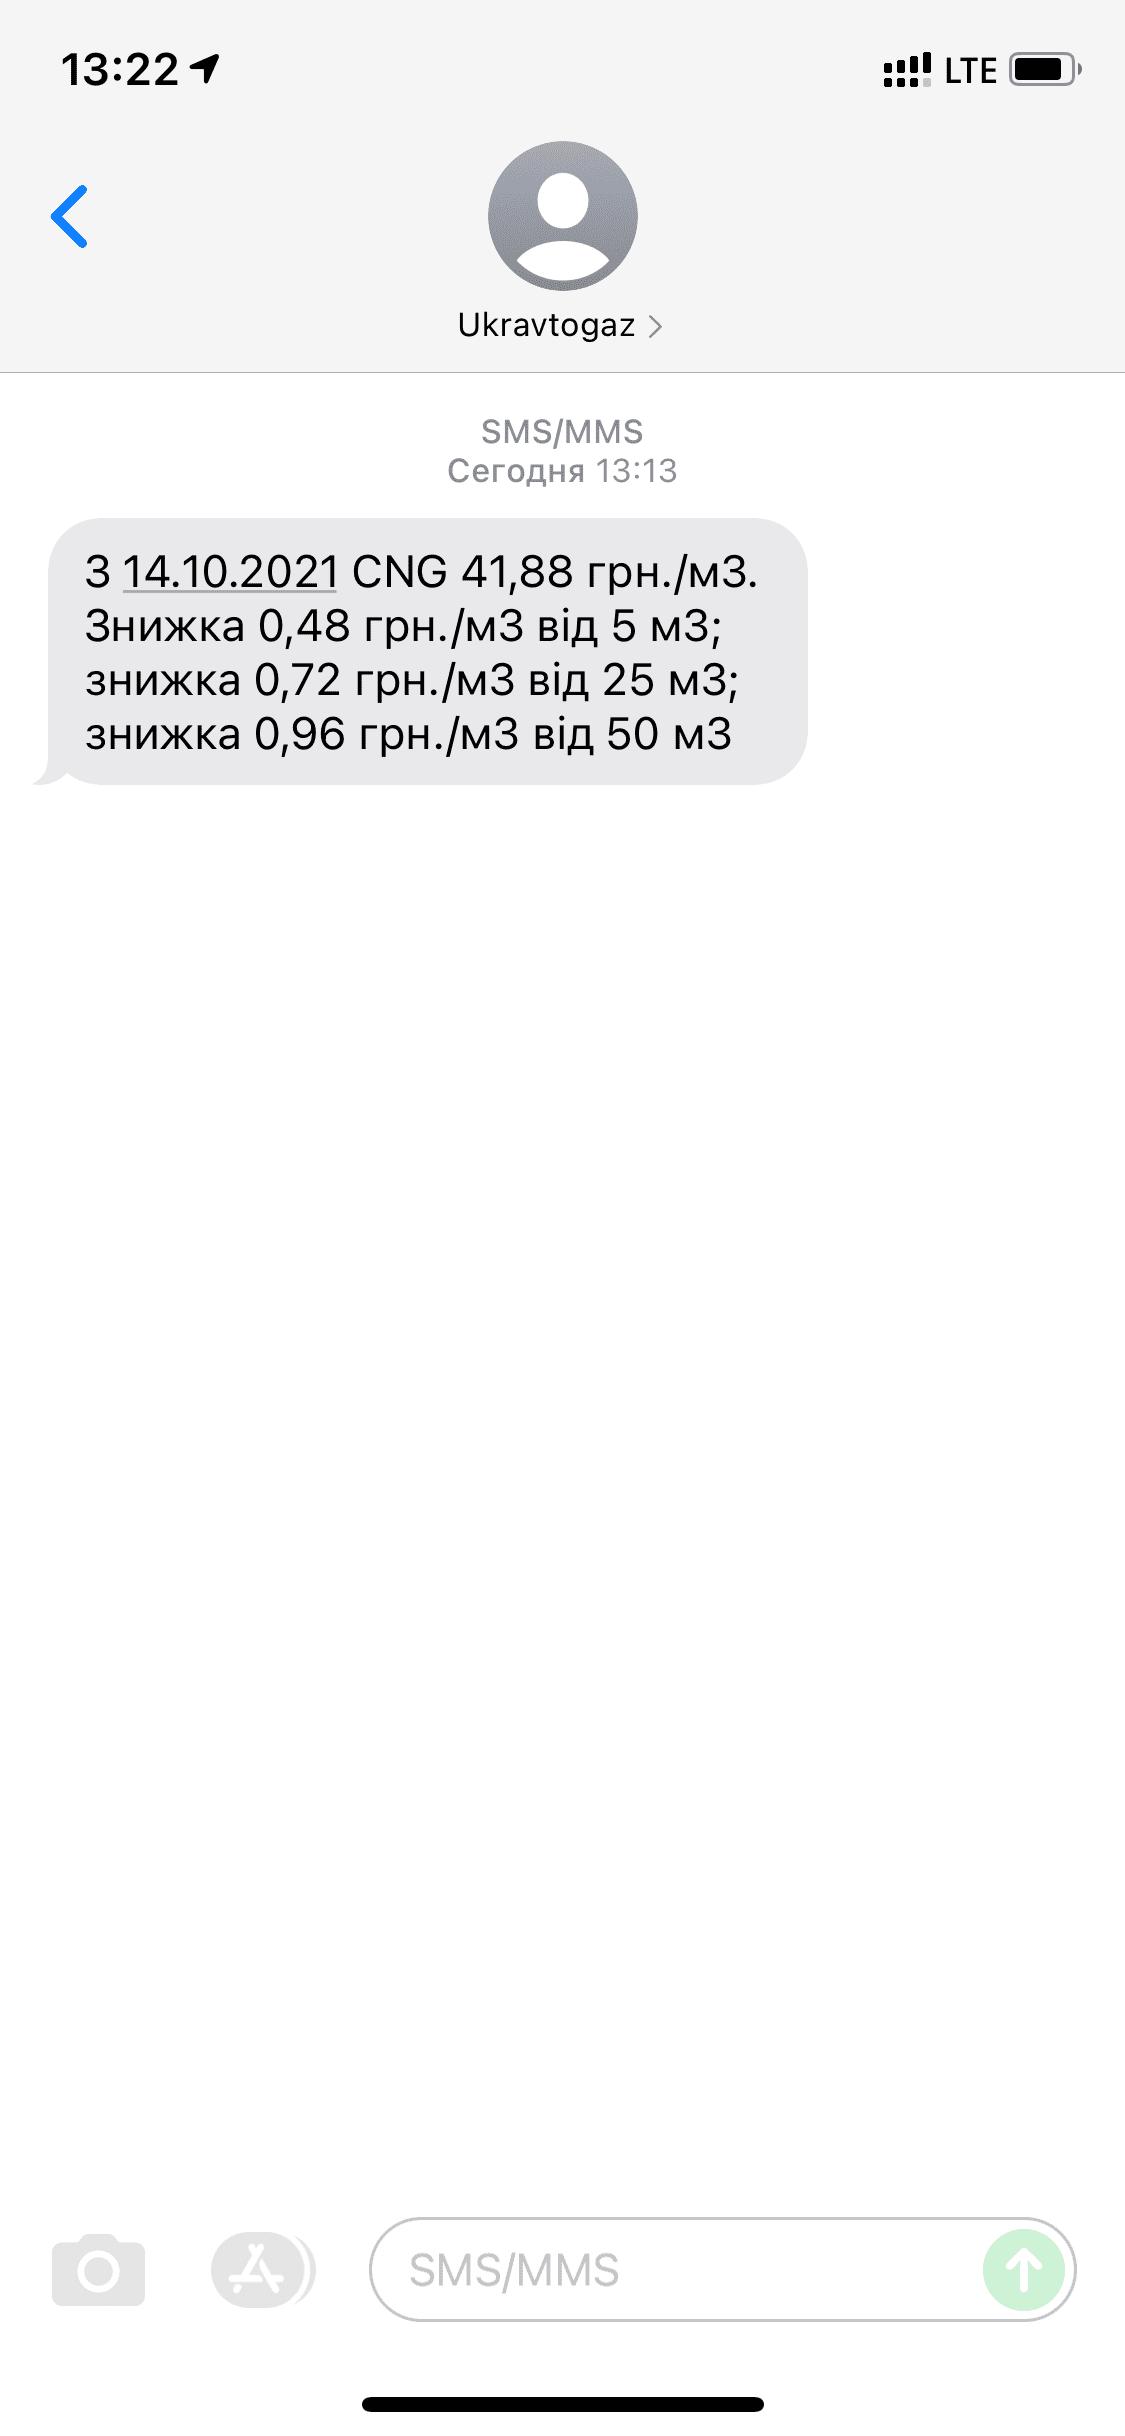 07677D77-6EAA-4D5D-9573-D1377447E62C.png